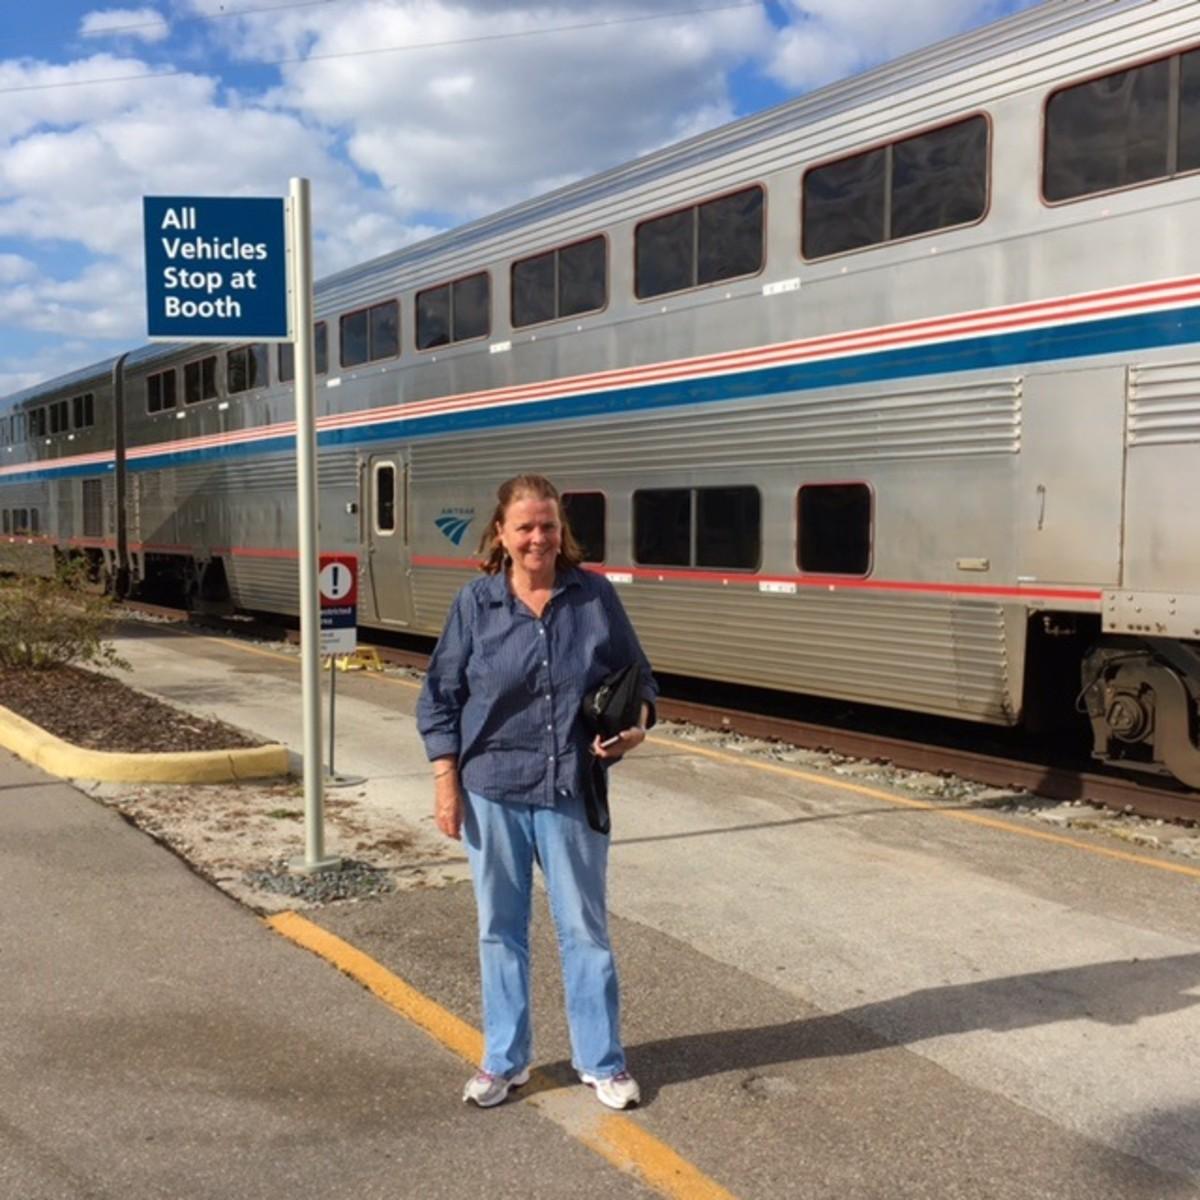 Auto Train Station in Sanford, FL